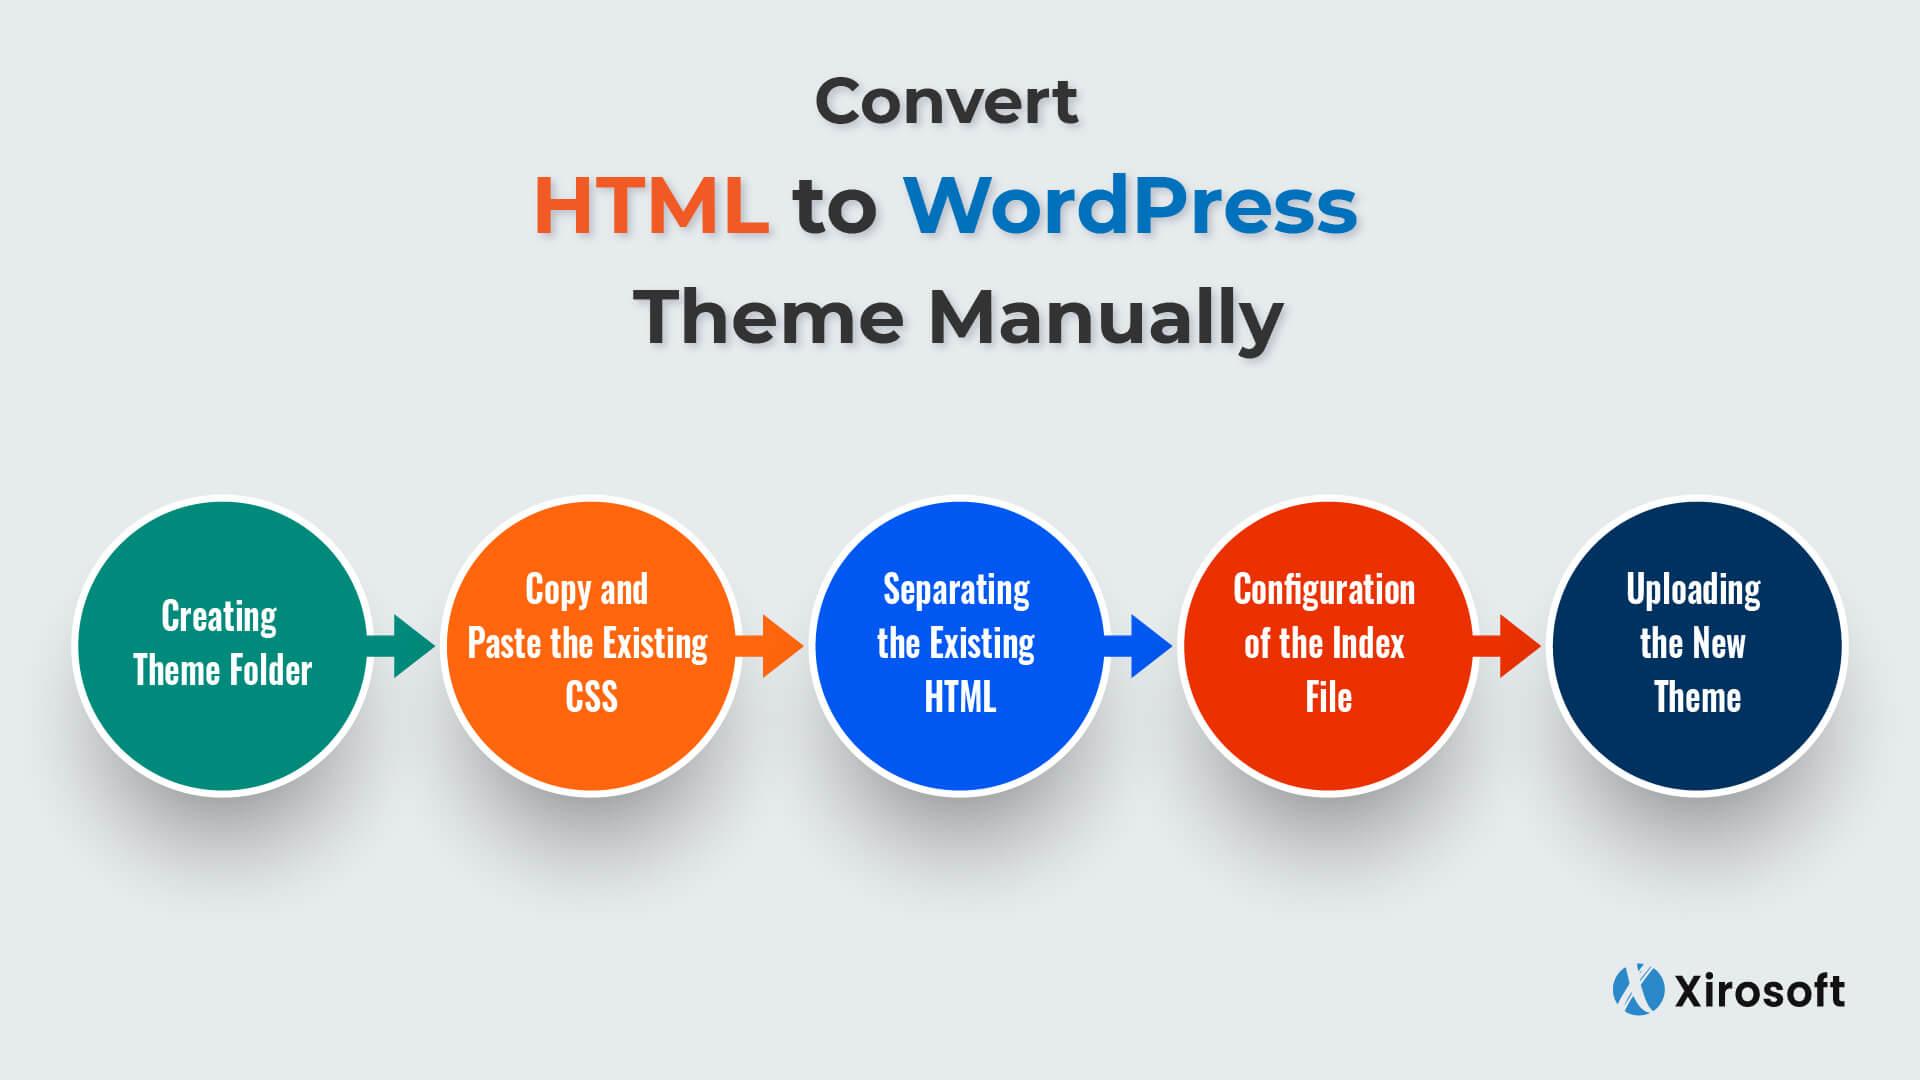 How to Convert HTML to WordPress Theme - Xirosoft Guide